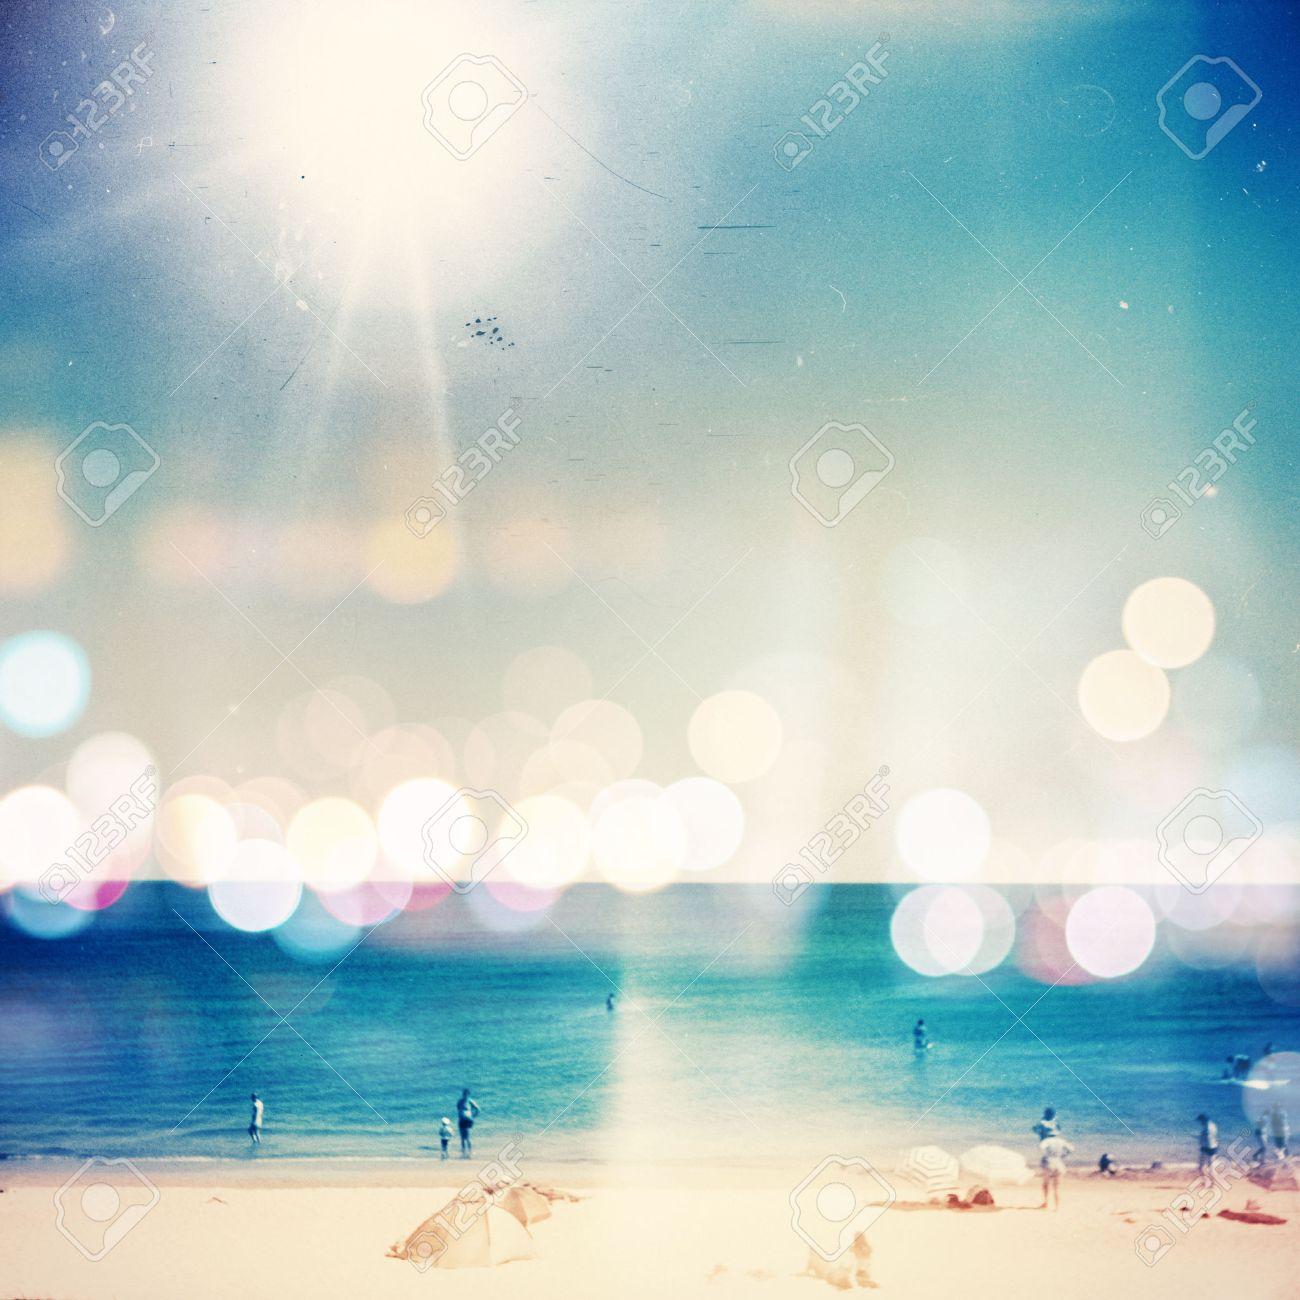 Retro medium format photo. Sunny day on the beach. Grain, blur added as vintage effect. Stock Photo - 35064570